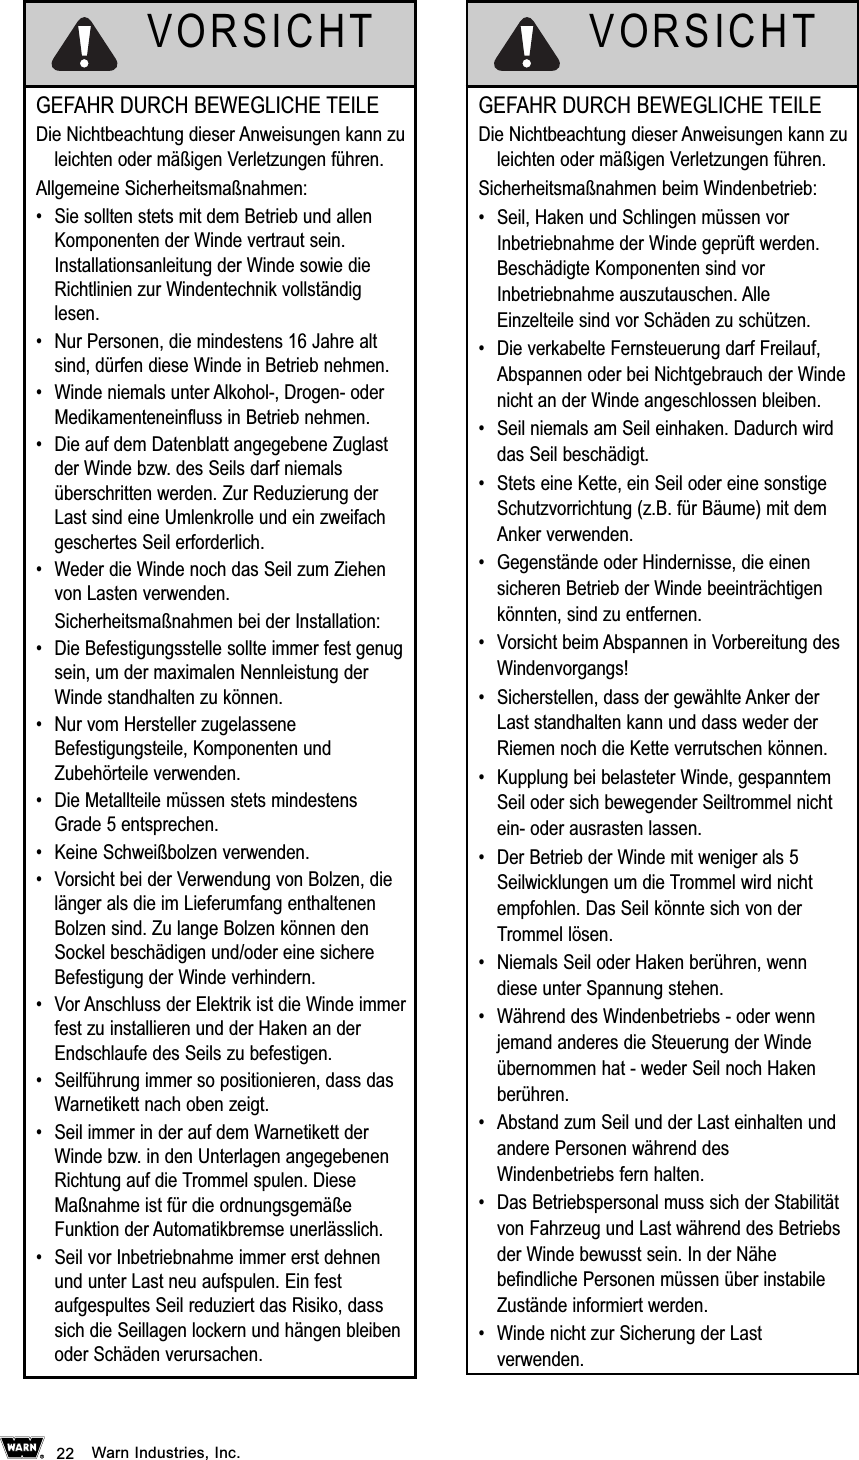 Nett 1989 Vorstadt Schaltplan Fotos - Elektrische Schaltplan-Ideen ...